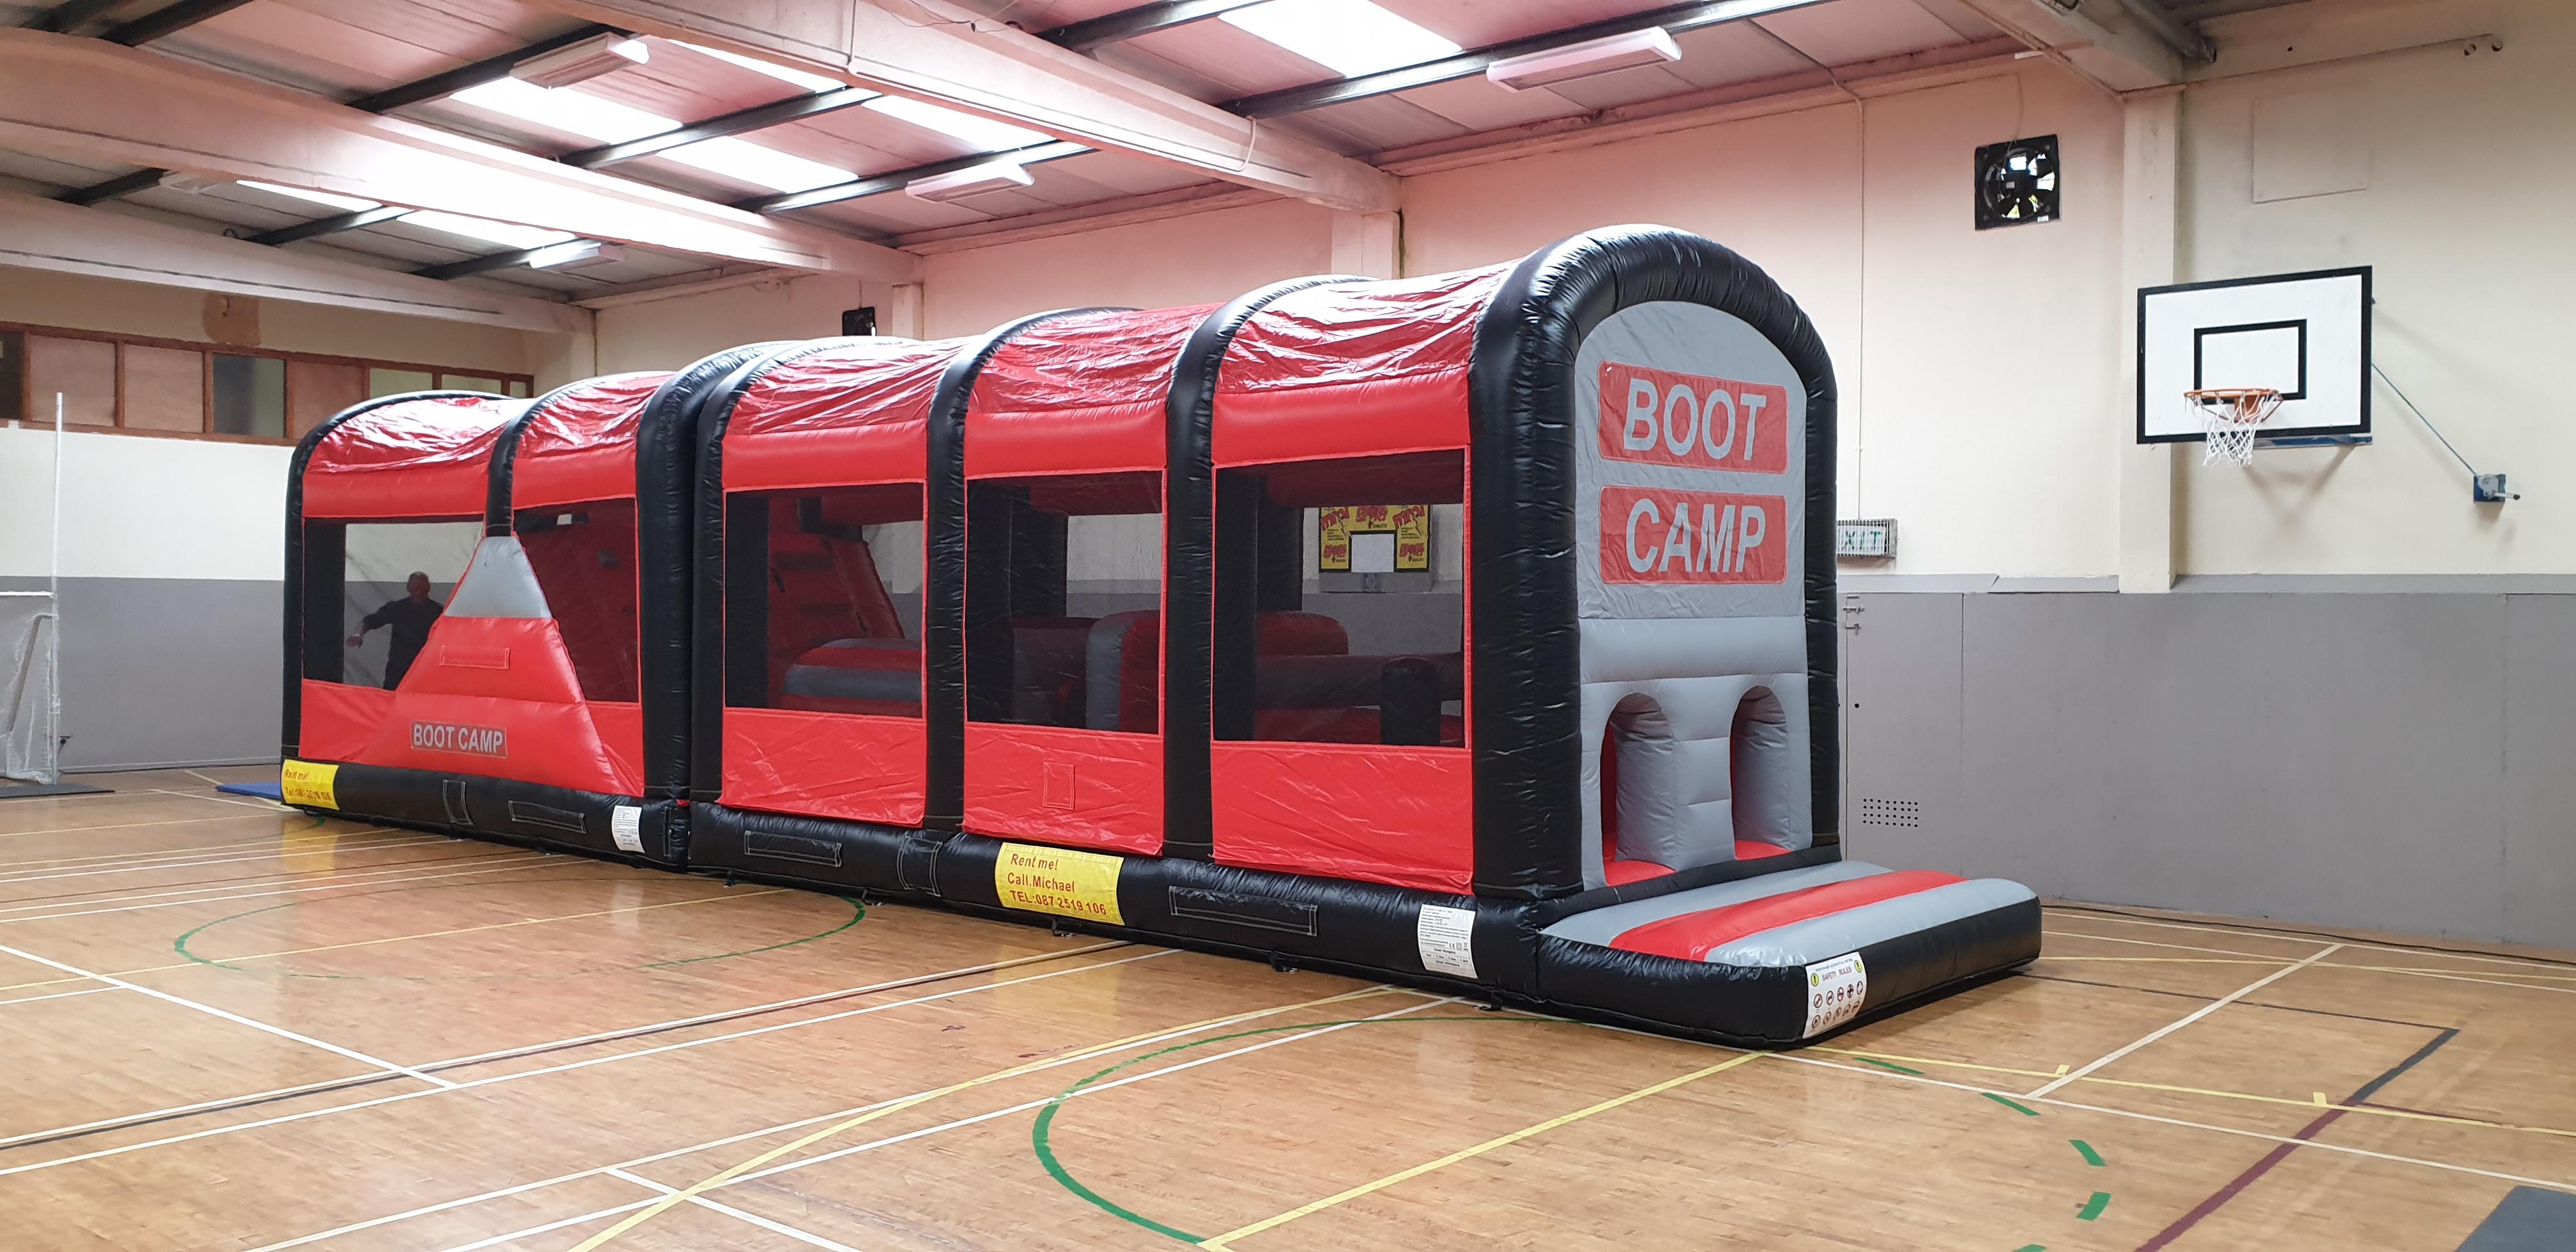 Boot Camp Sligo Bouncy Castles.jpg